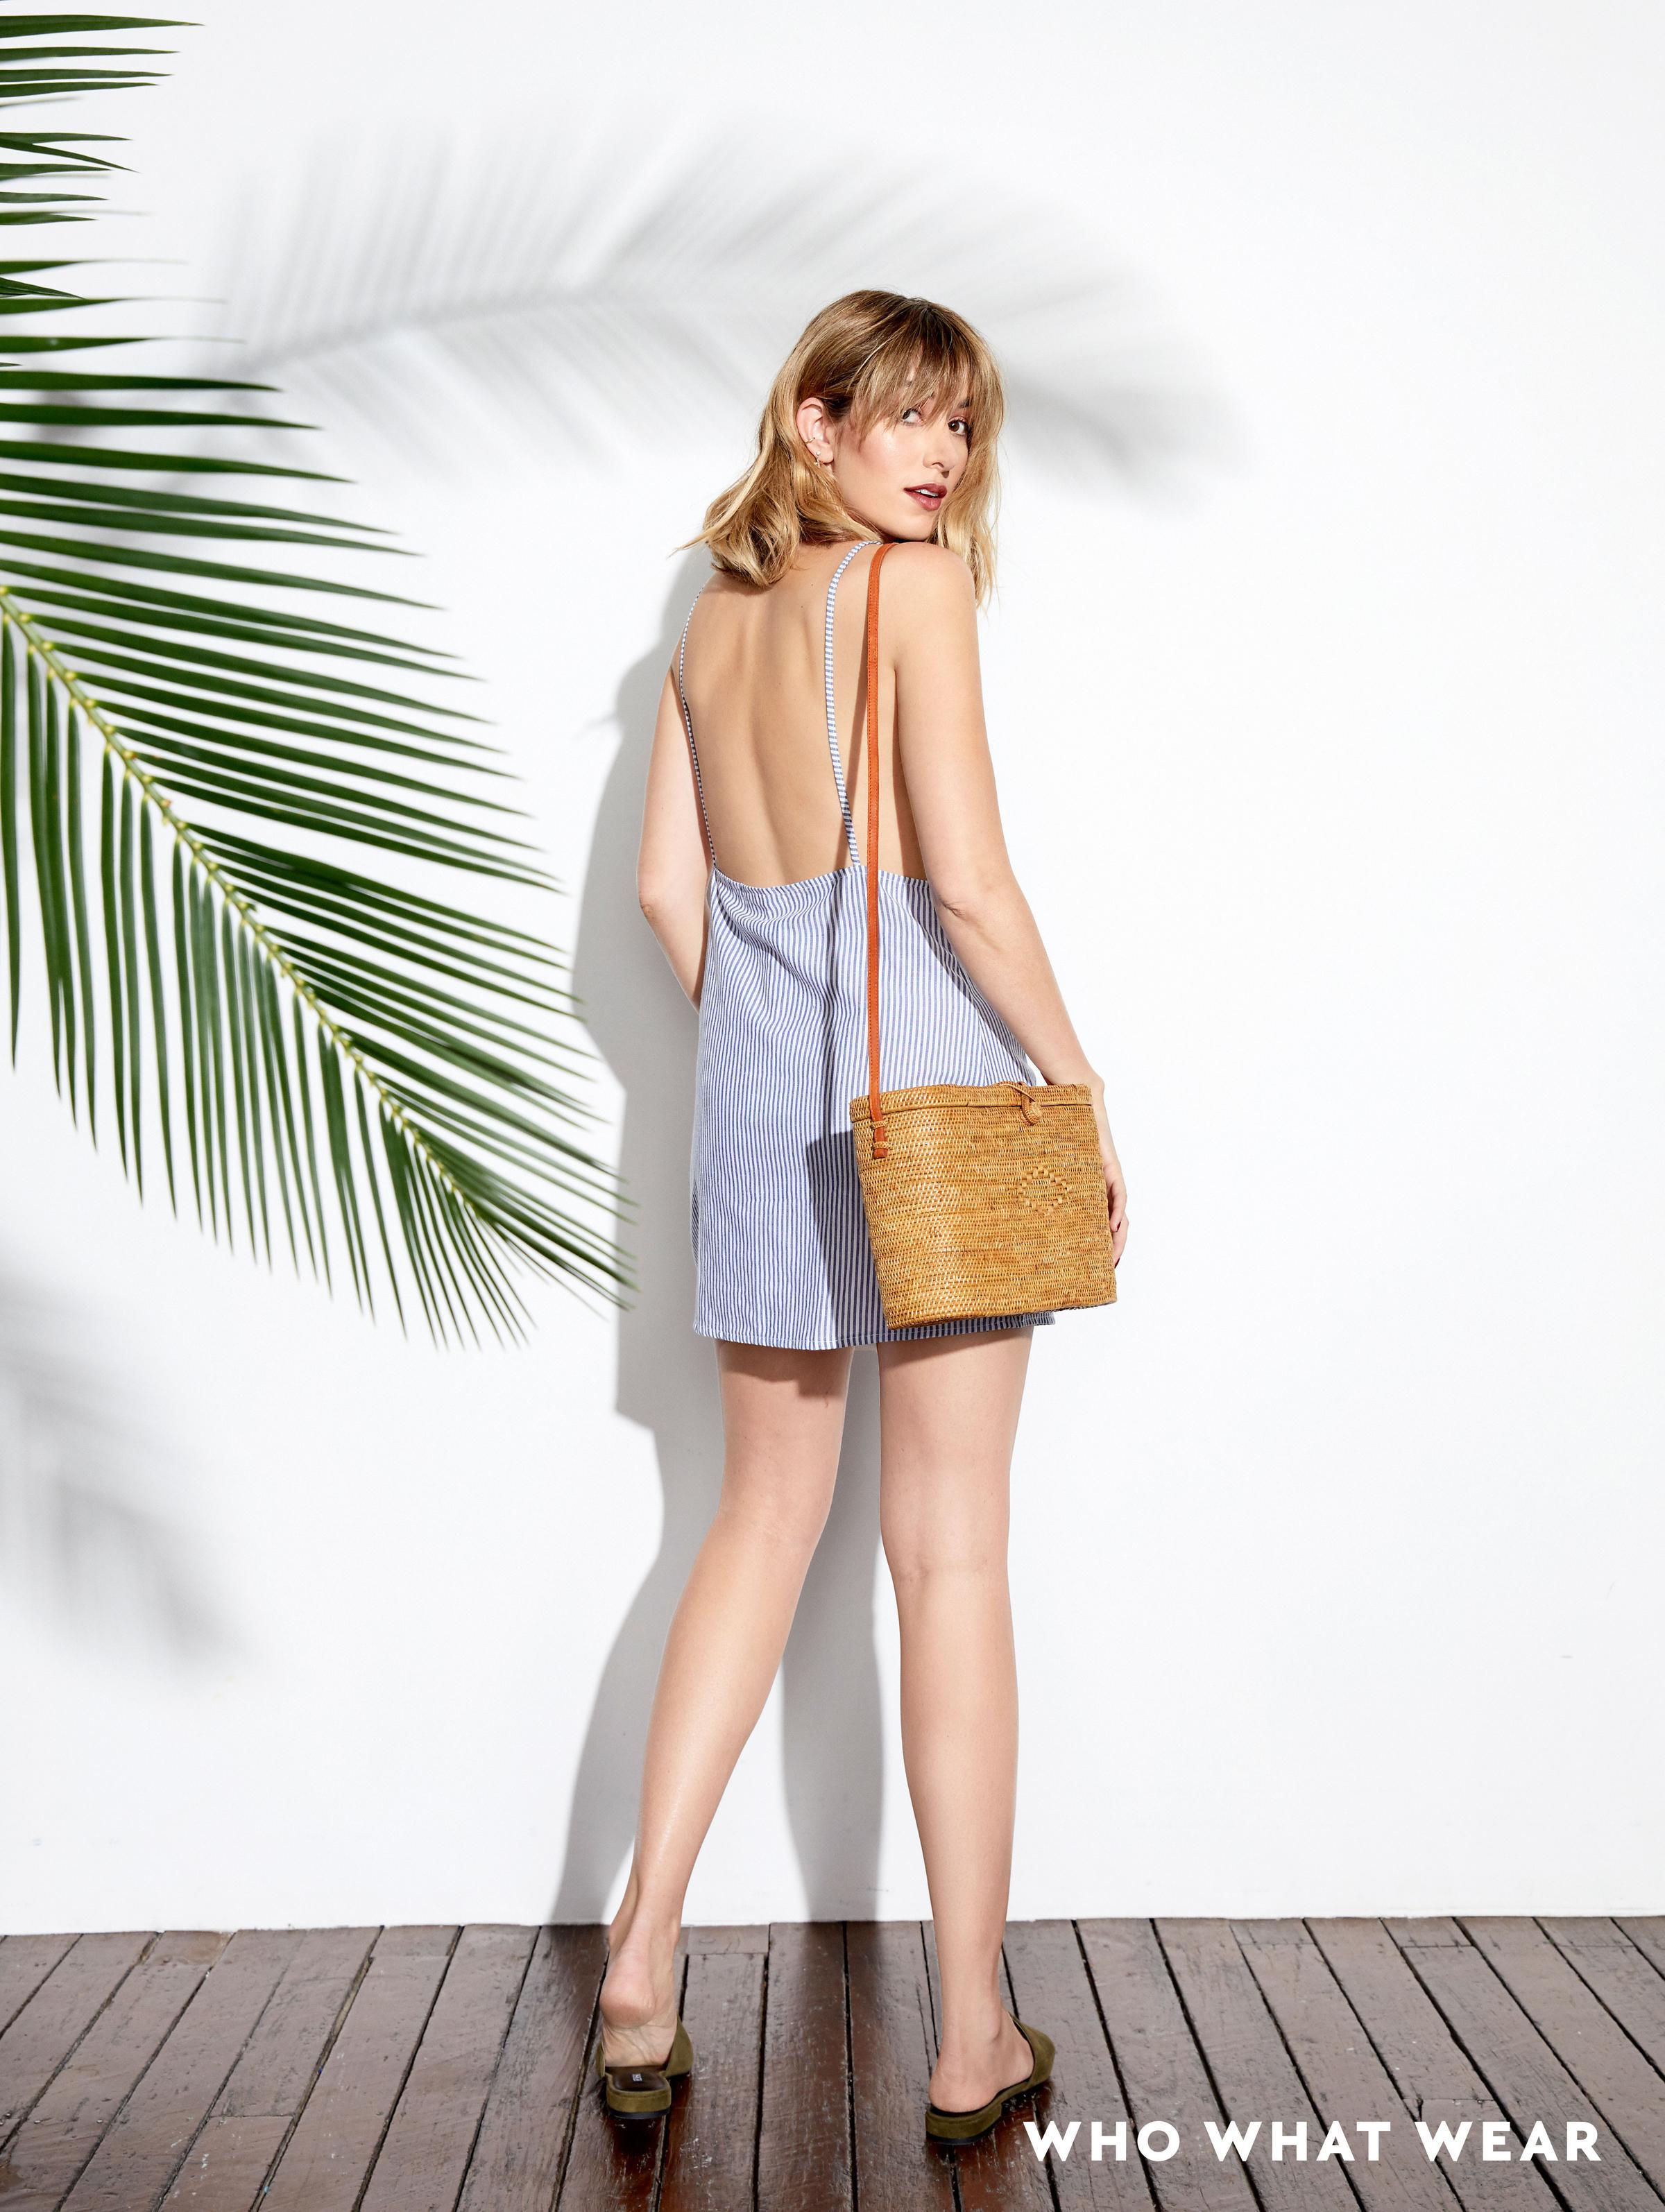 "<p><em>Pictured: Posse <a href=""http://www.theposse.com.au/shop-1/jane-dress-stripe"" target=""_blank"">Jane Dress in Stripe</a>($99), Sunday Living <a..."